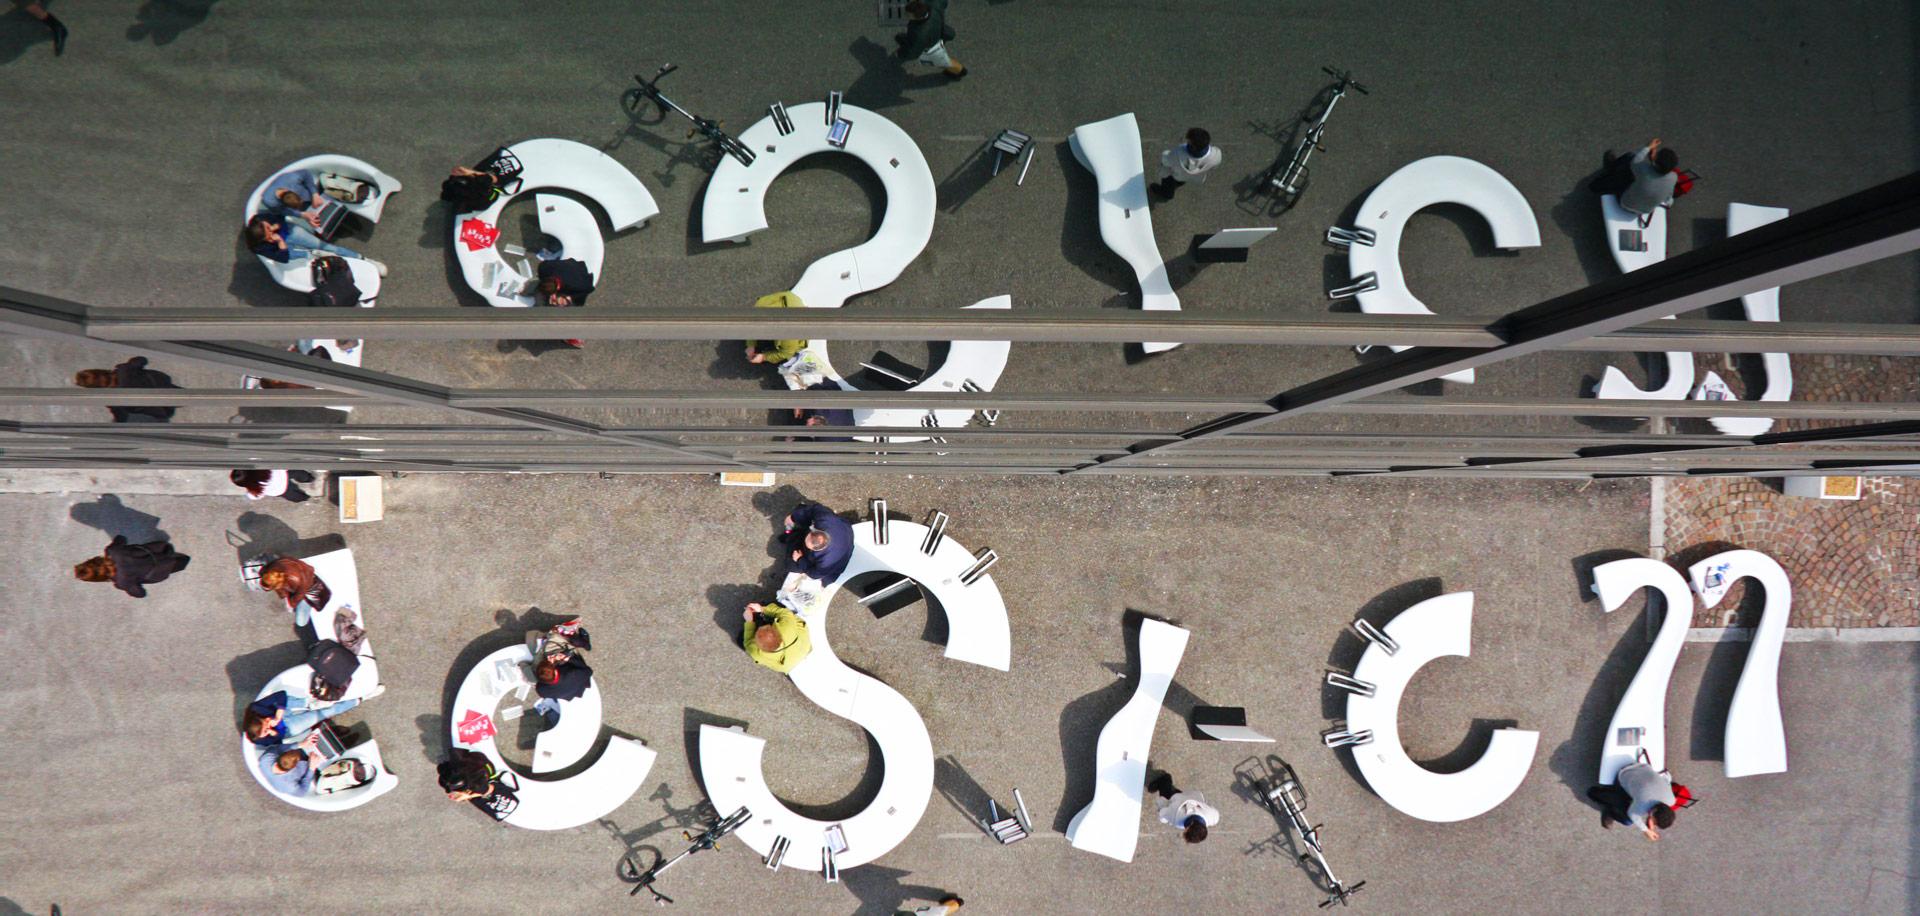 City Alphabet - miejskie meble parkowe